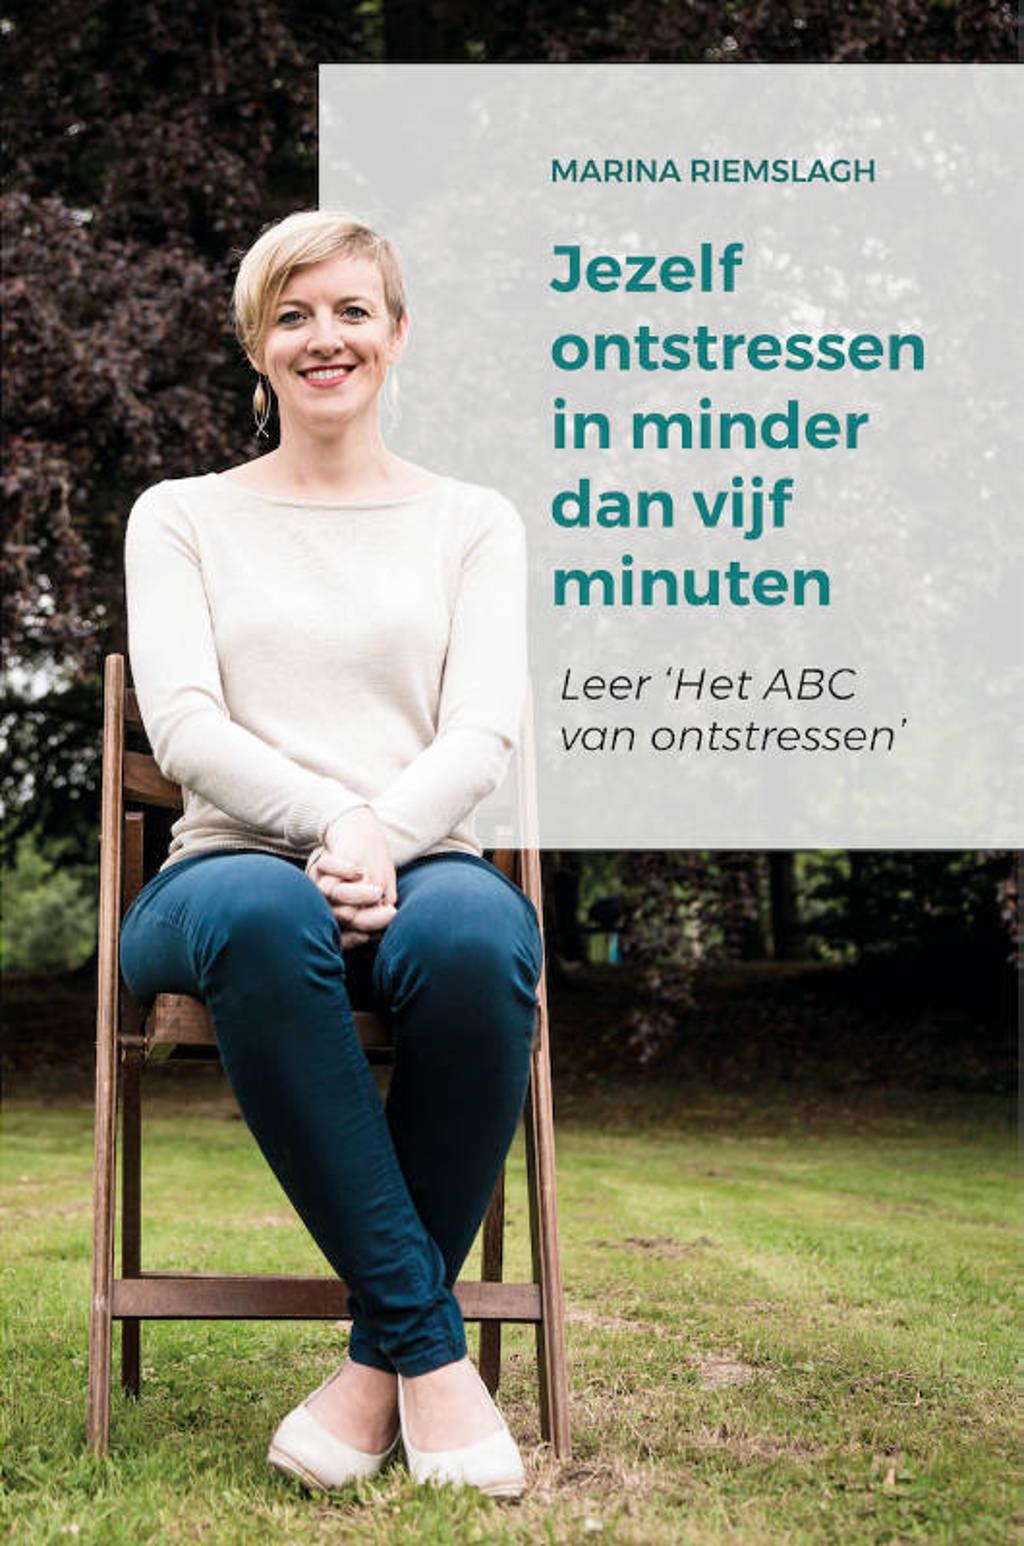 Jezelf ontstressen in minder dan vijf minuten - Marina Riemslagh